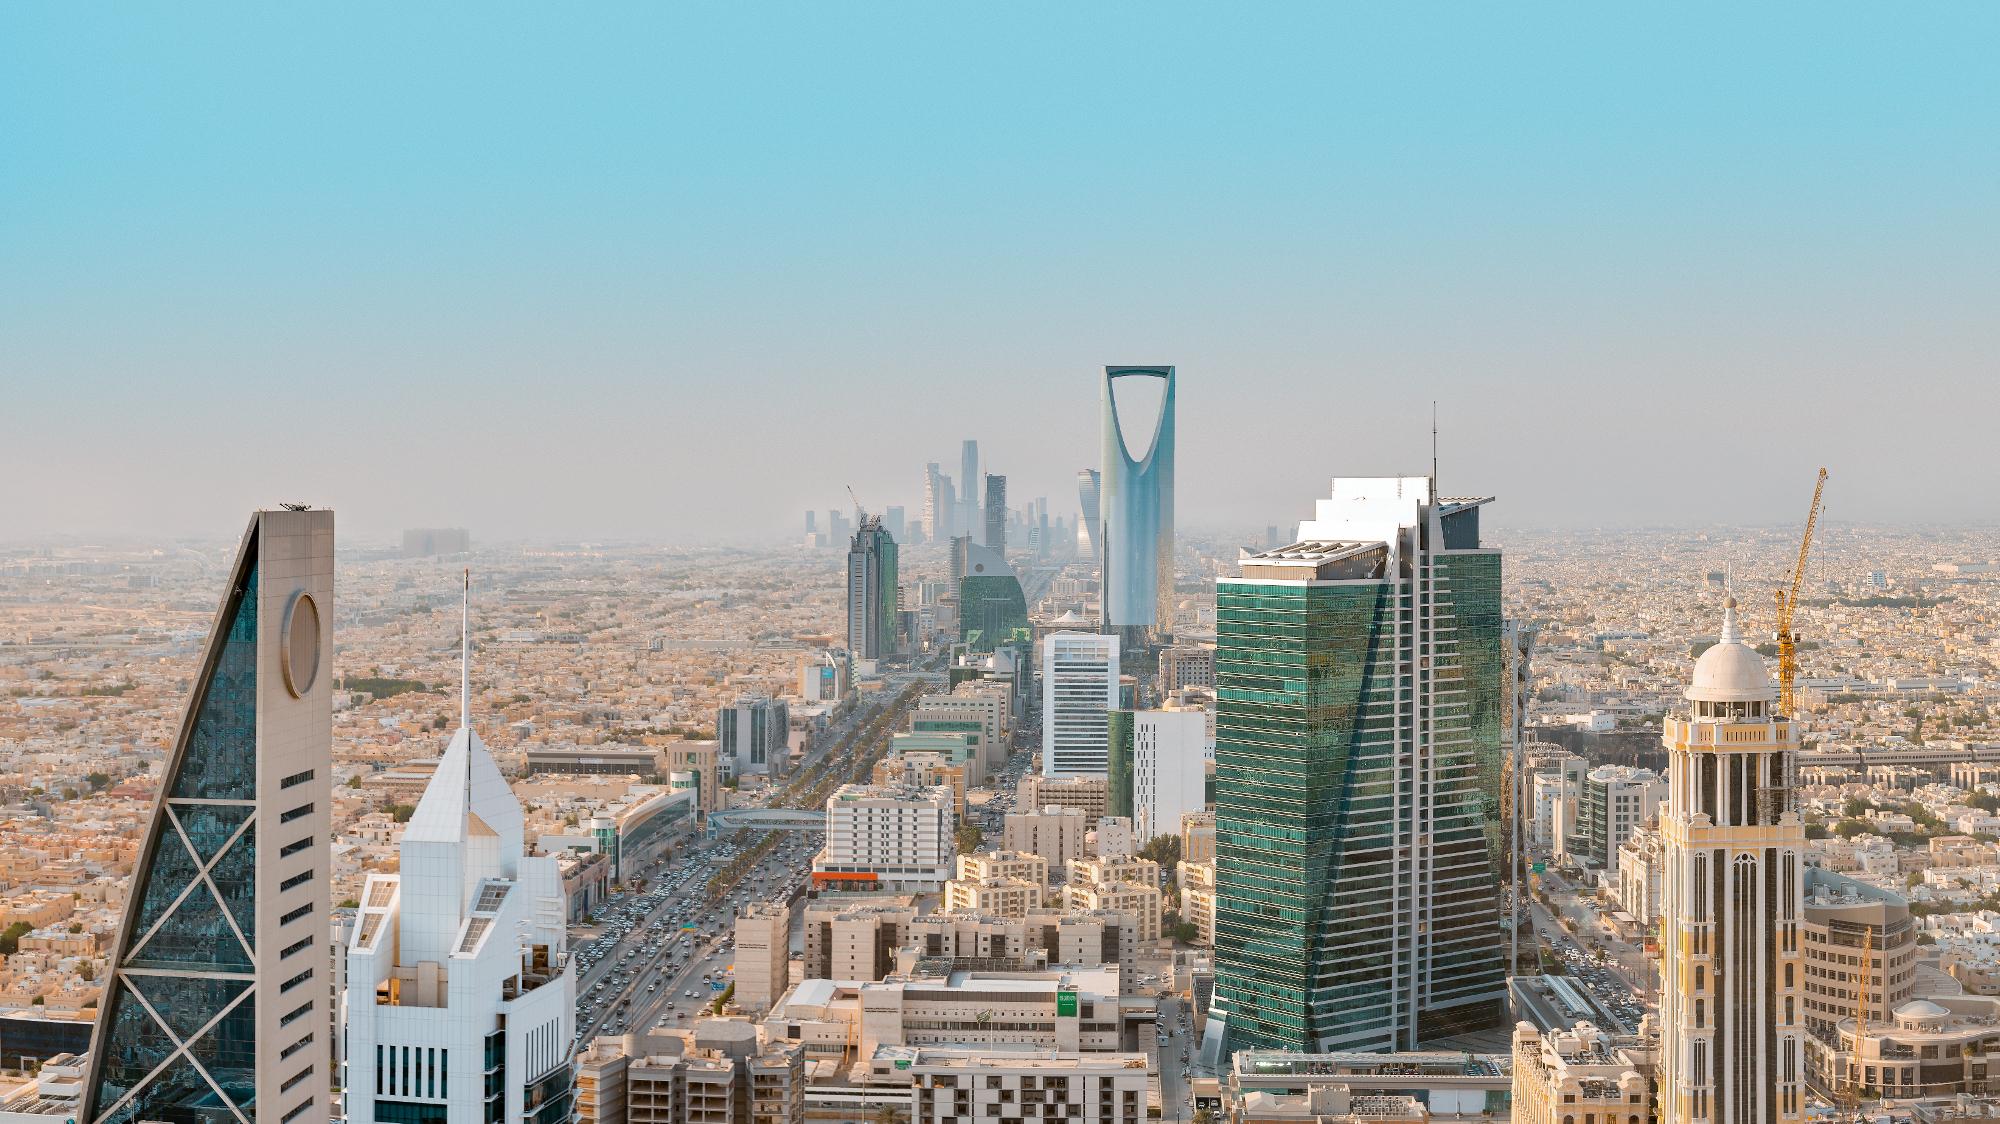 SIDC 2020 – Saudi International Dental Conference